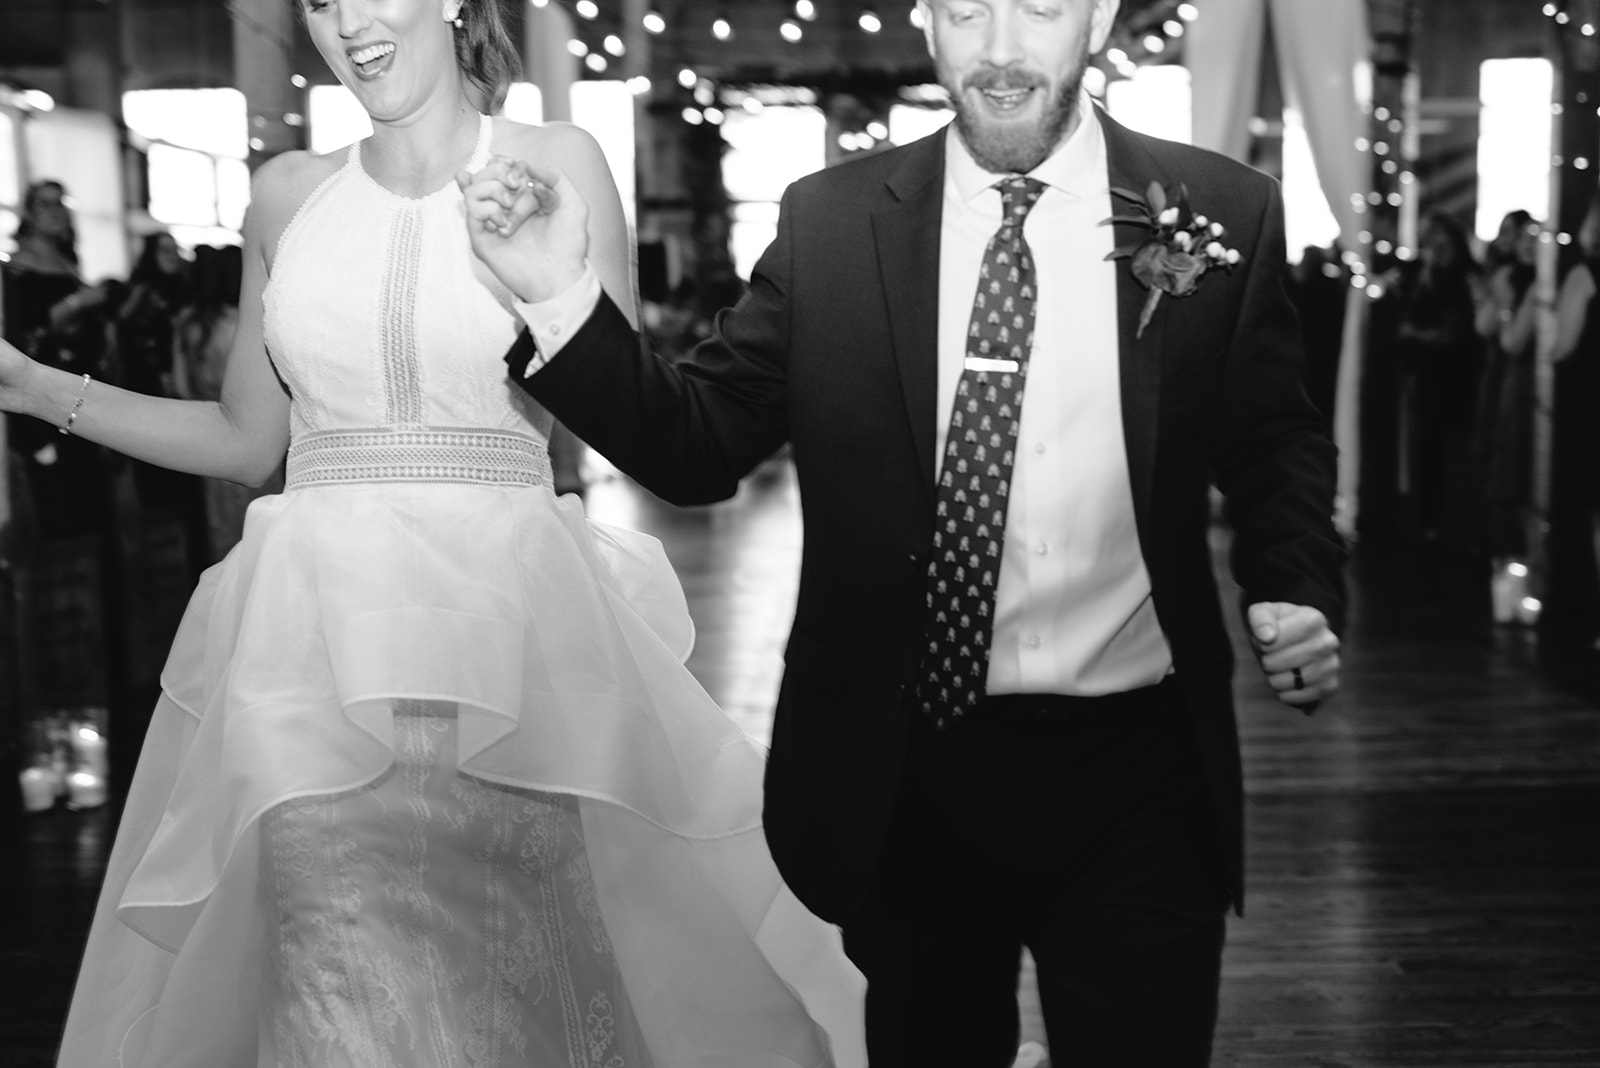 Art Factory Wedding- Industrial Chic- Audrey+Ryan- Paterson NJ- Olivia Christina Photo (40).jpg